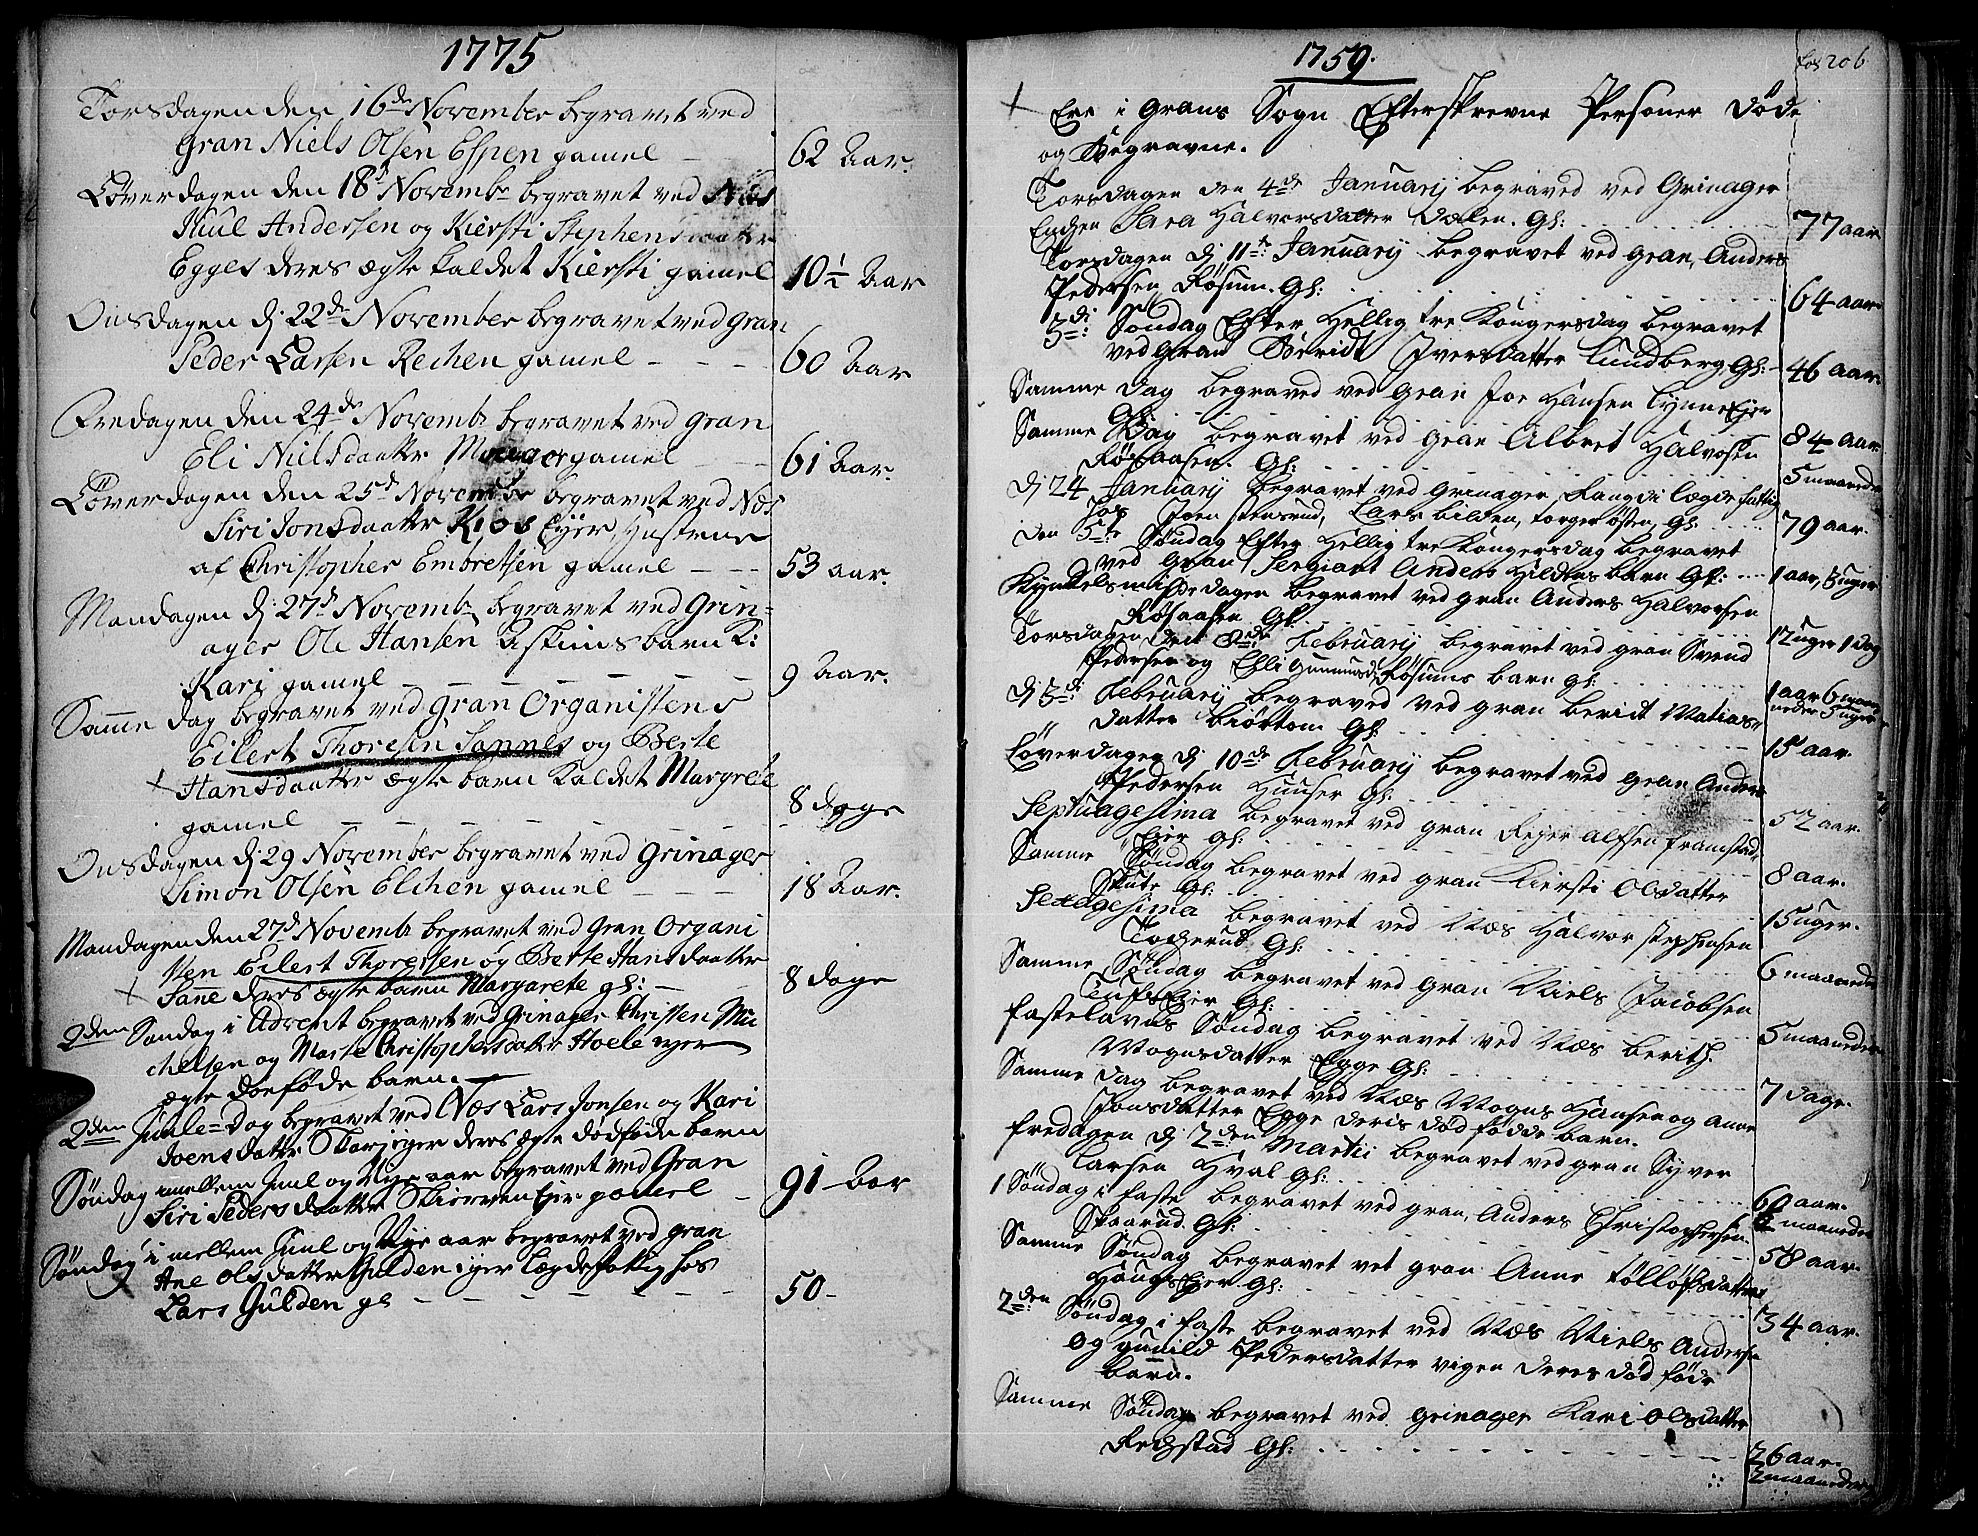 SAH, Gran prestekontor, Ministerialbok nr. 4, 1759-1775, s. 206